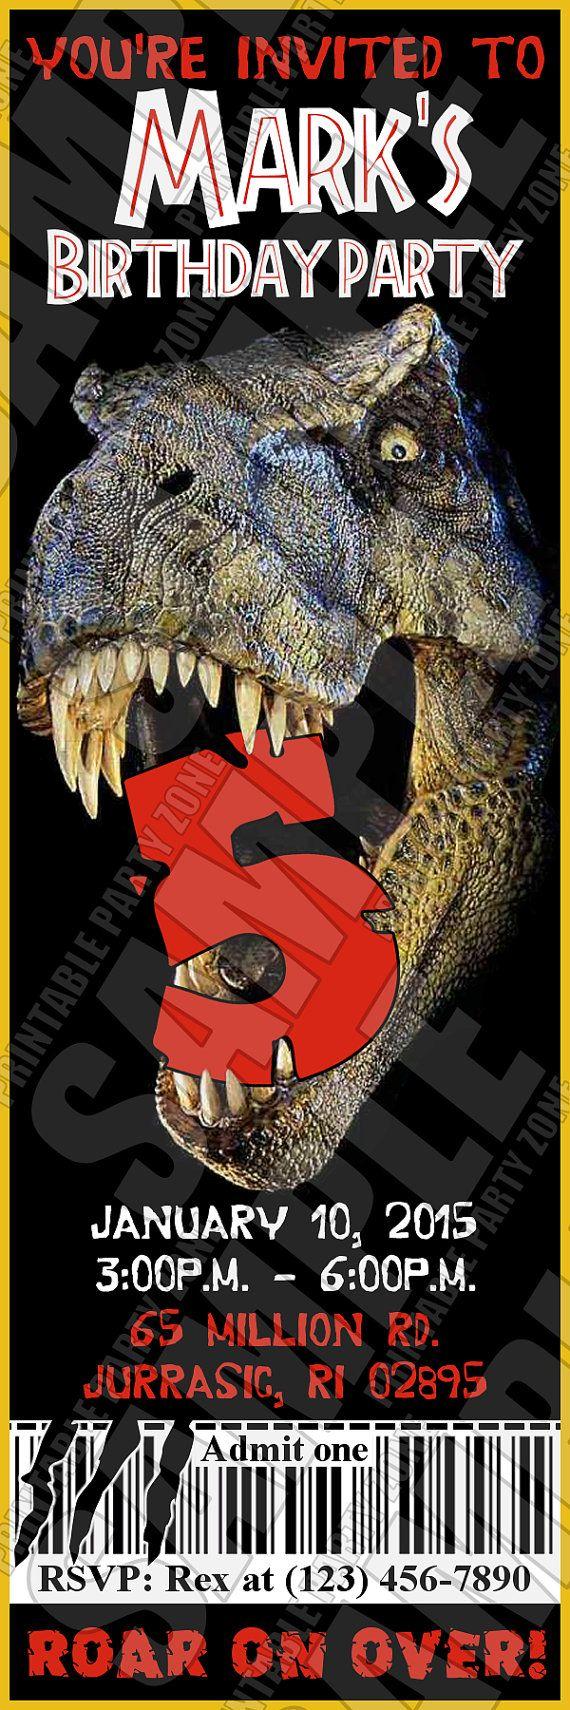 Jurassic park card 3 by chicagocubsfan24 on deviantart - Jurassic Park Invite Printable Birthday By Printablepartyzone